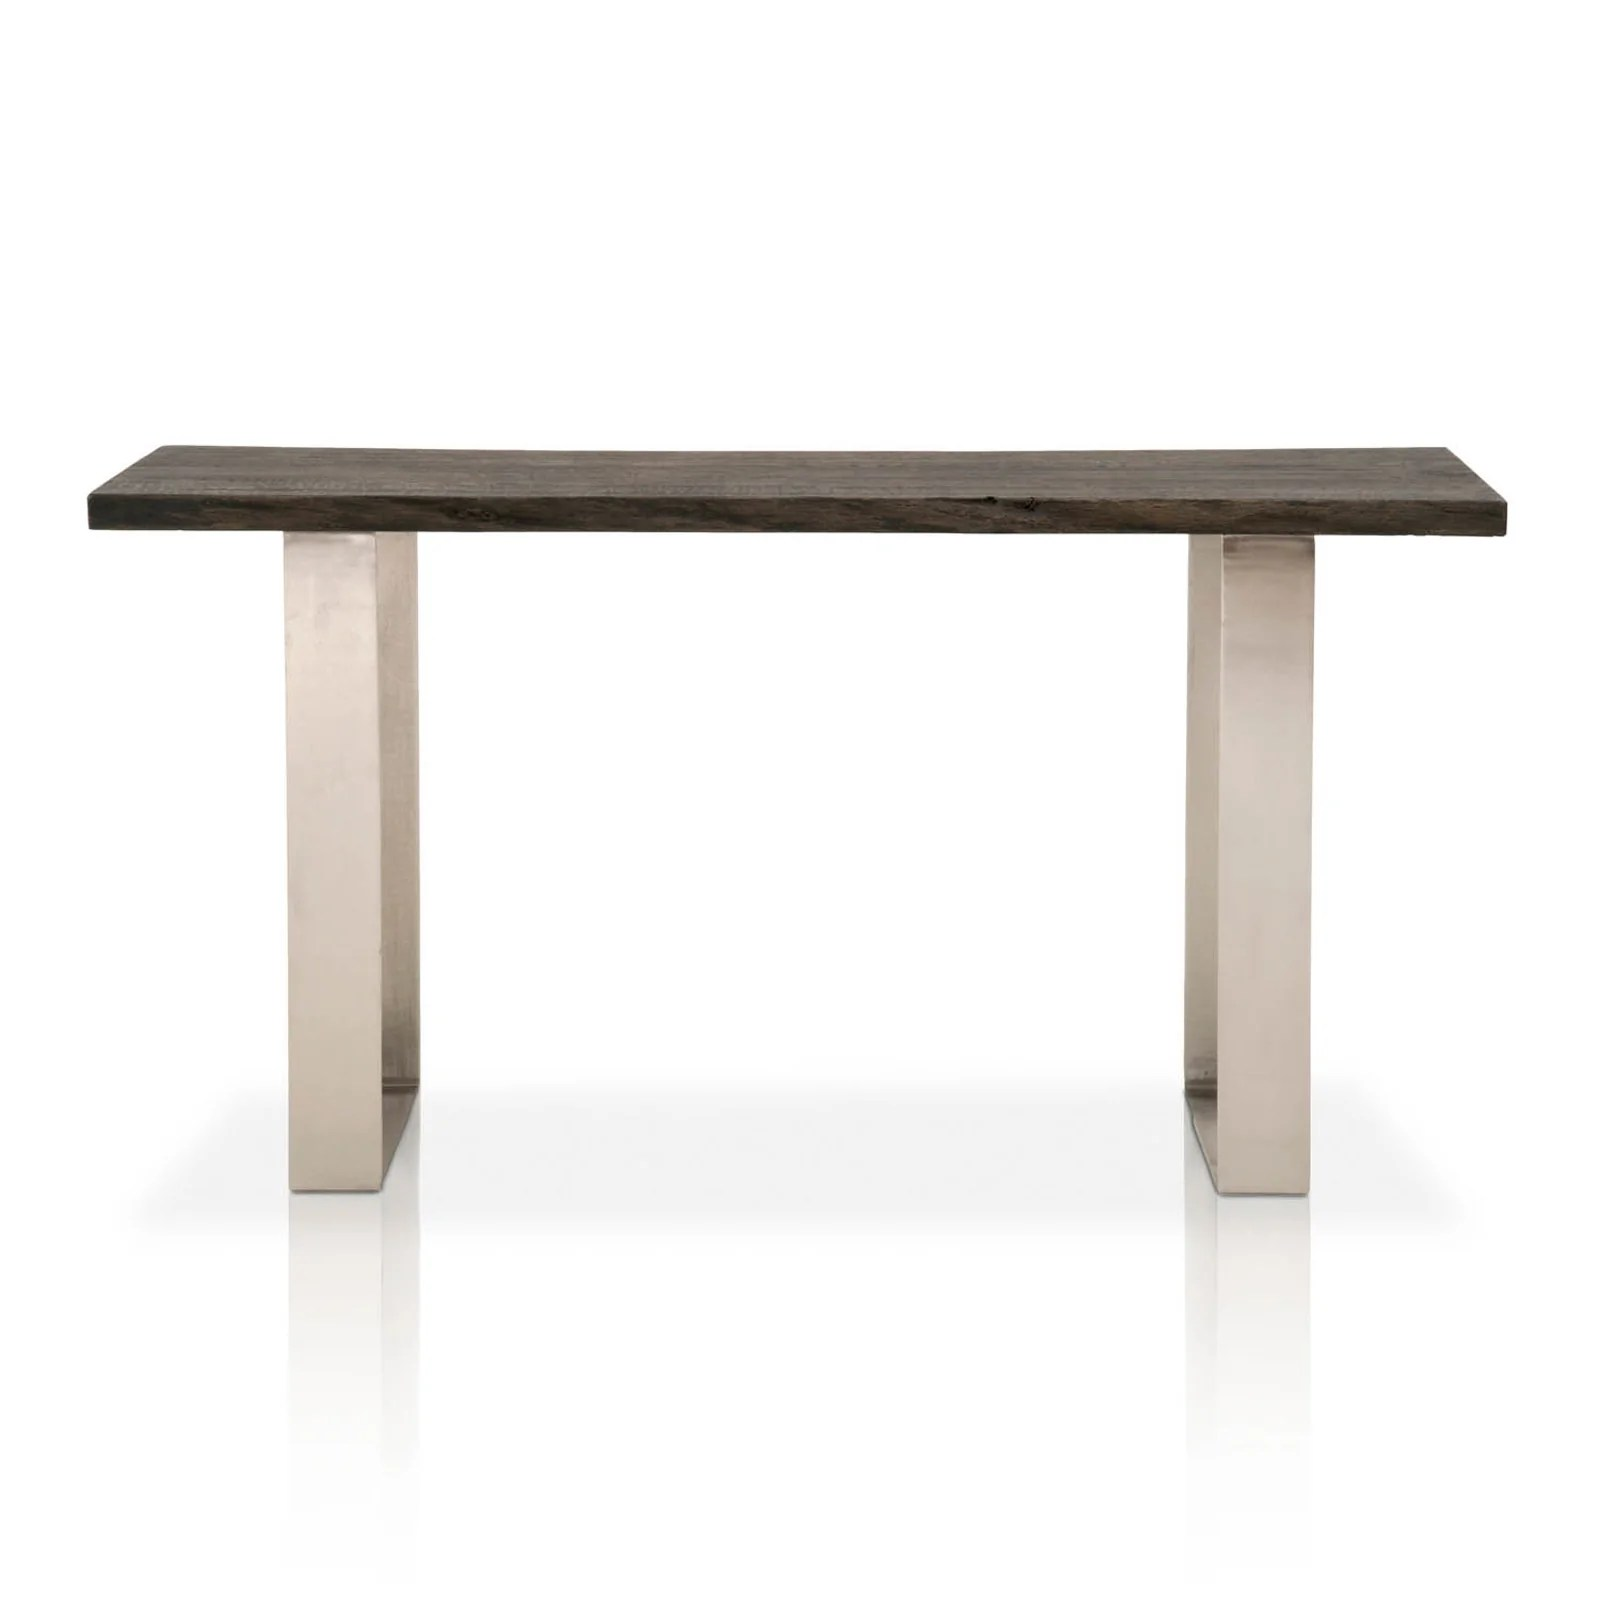 star furniture sofa table house of fraser corner amazing deal on international 4624 bnic bco